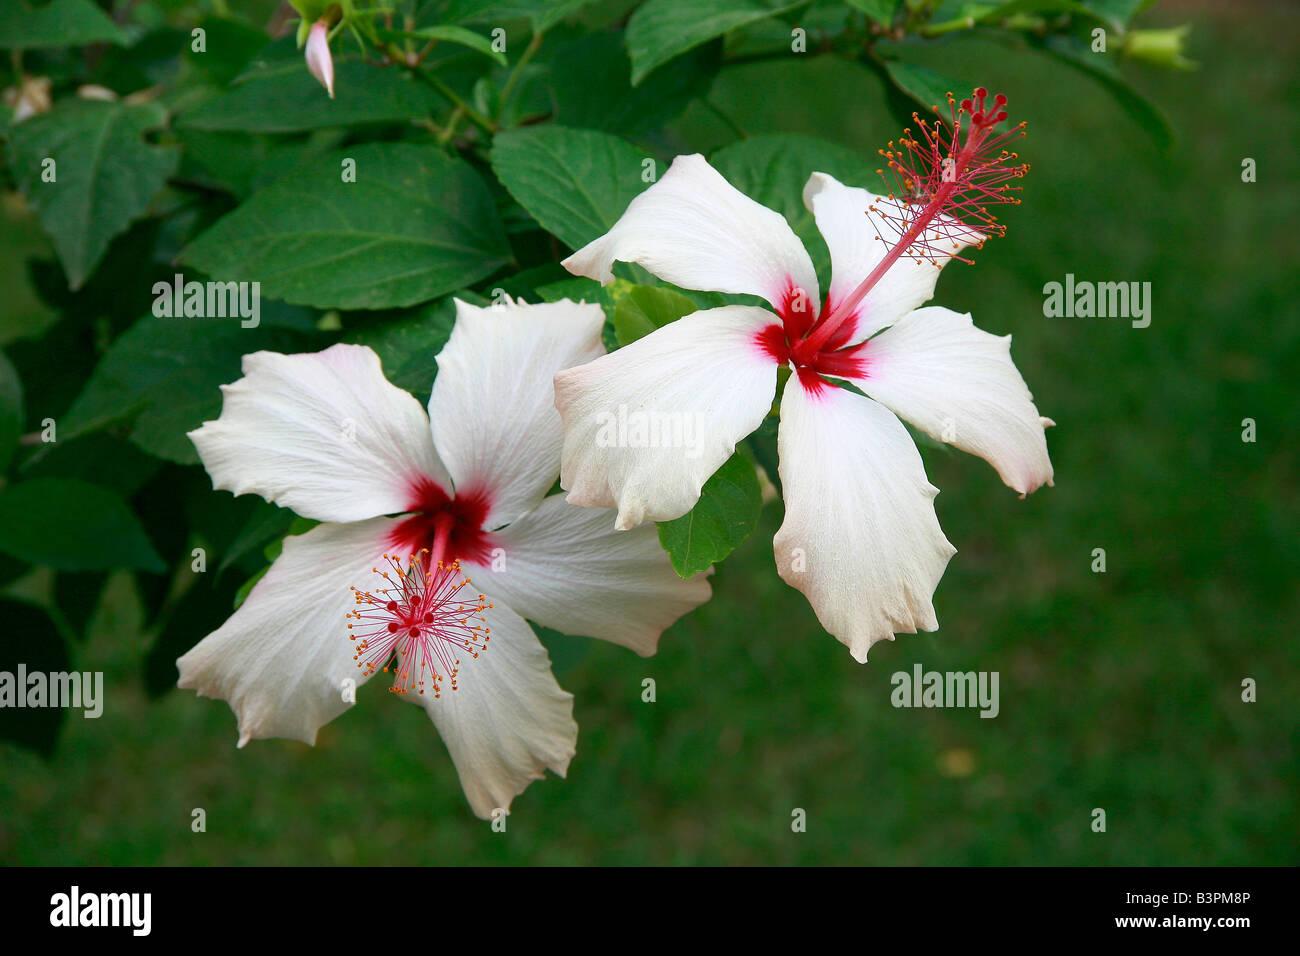 Hibiscus Rosa Sinensis White Wings Stock Photo 19553206 Alamy